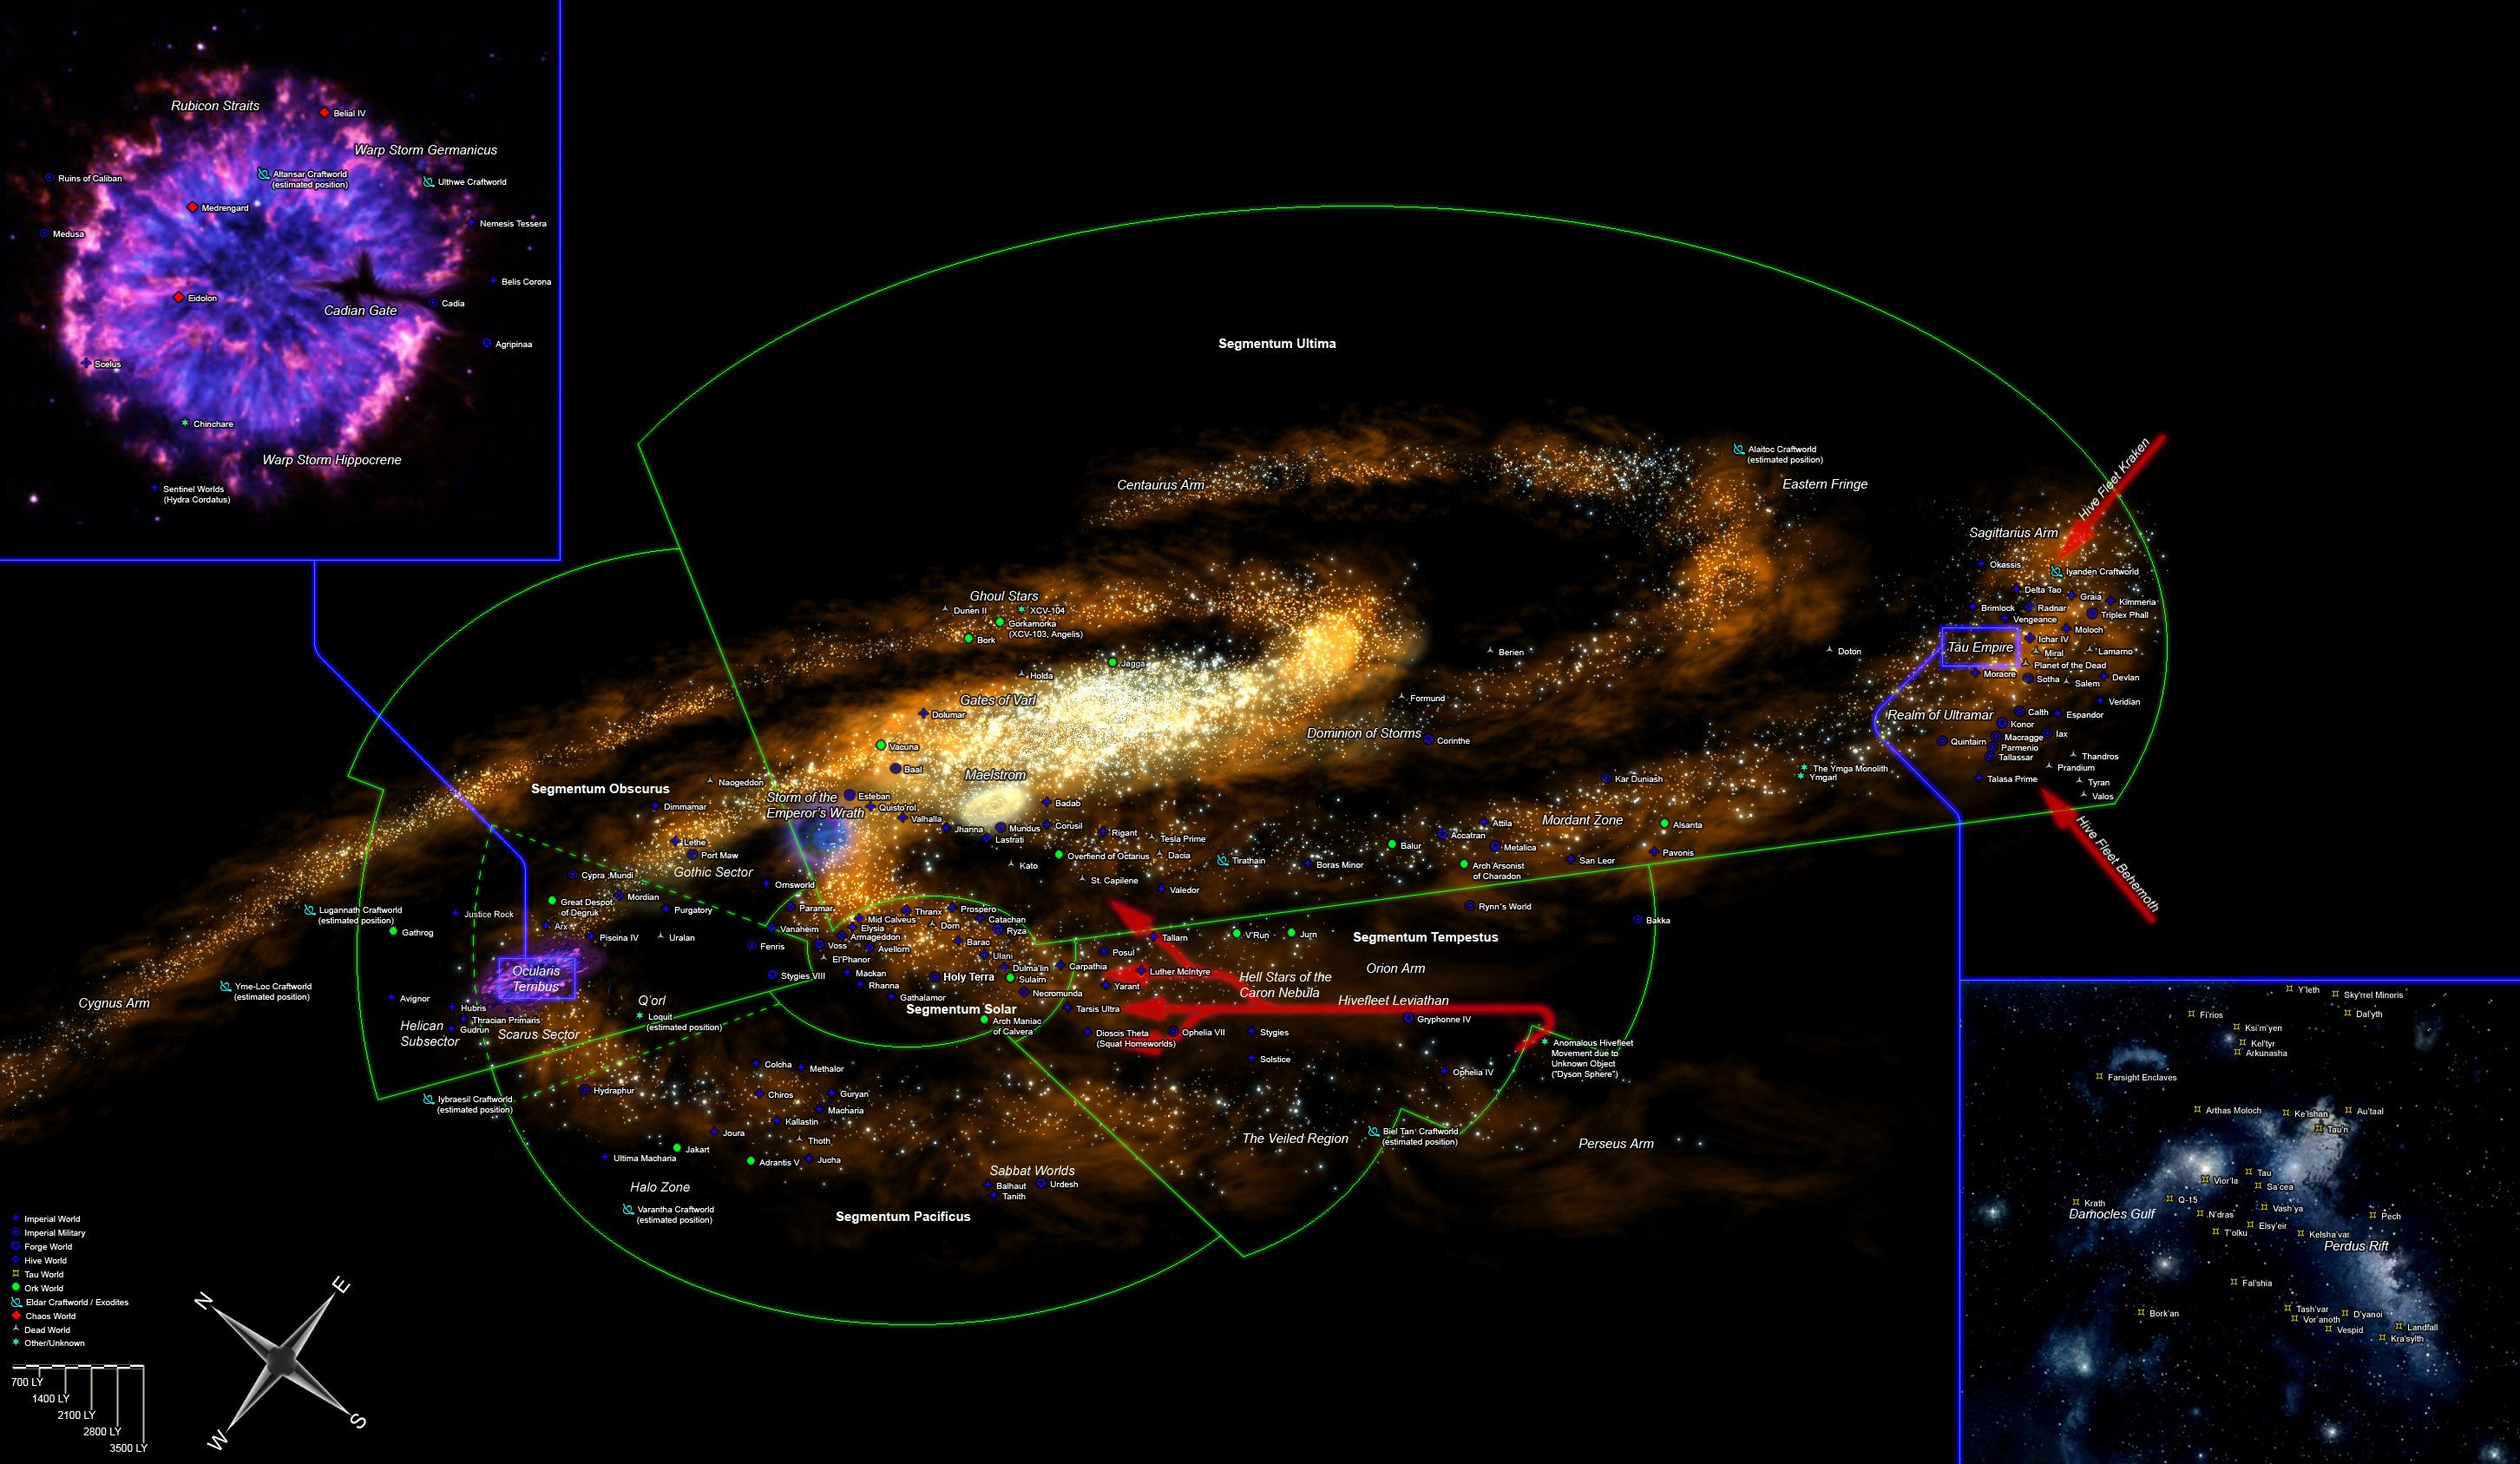 Milky Way Galaxy Warhammer 40k